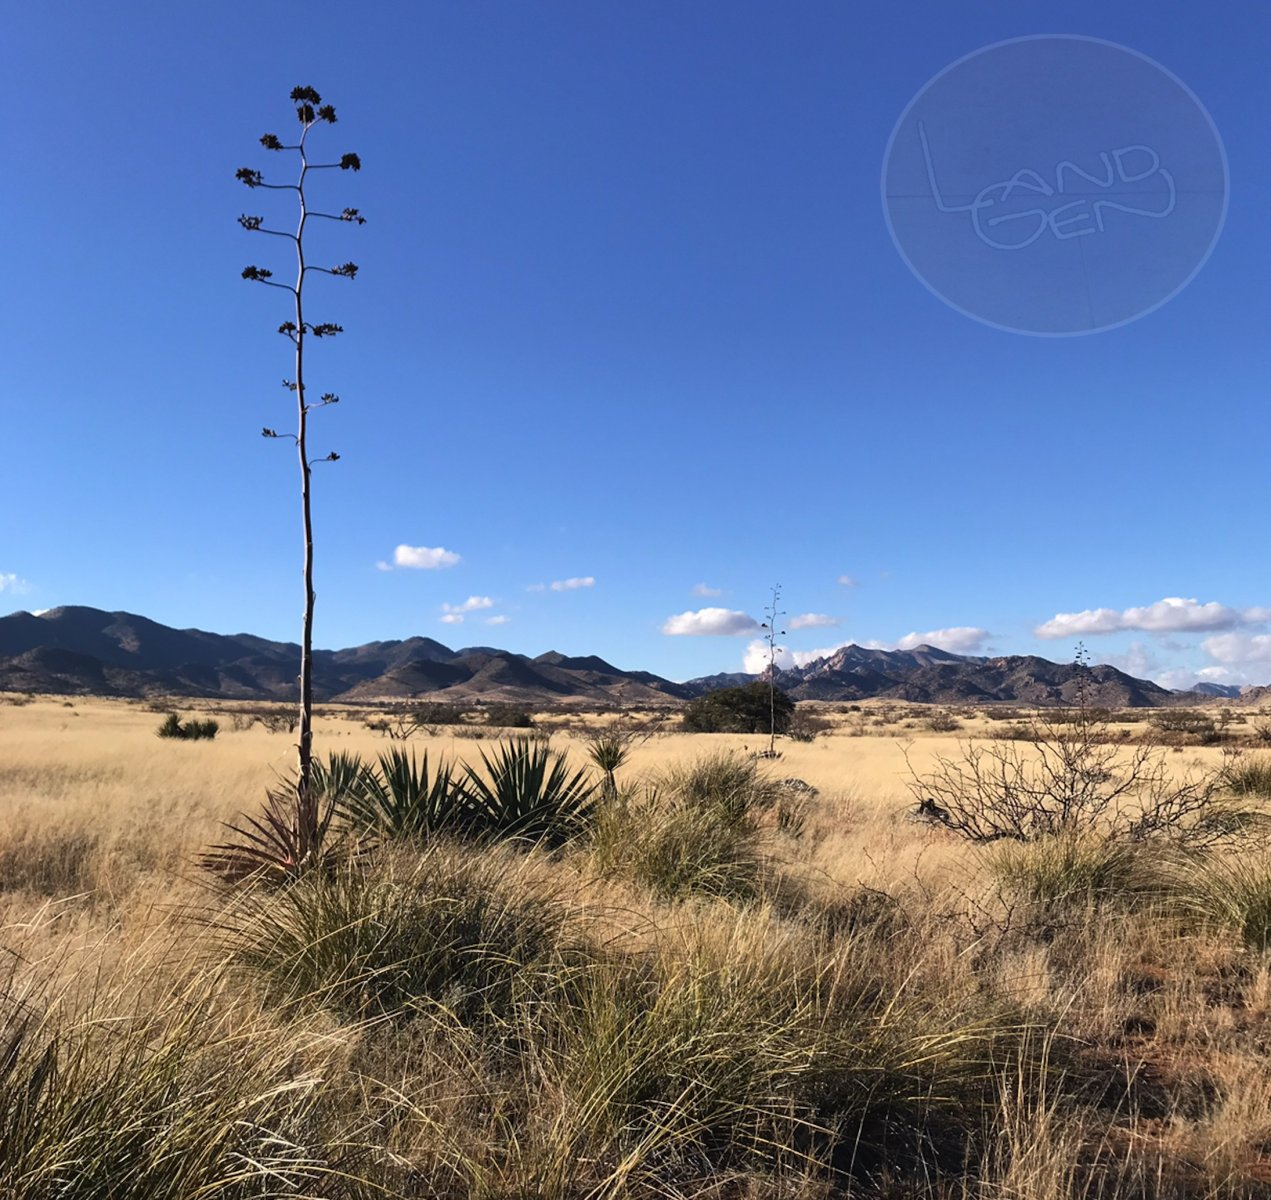 5 Acres in Cochise County, AZ! - LandGen